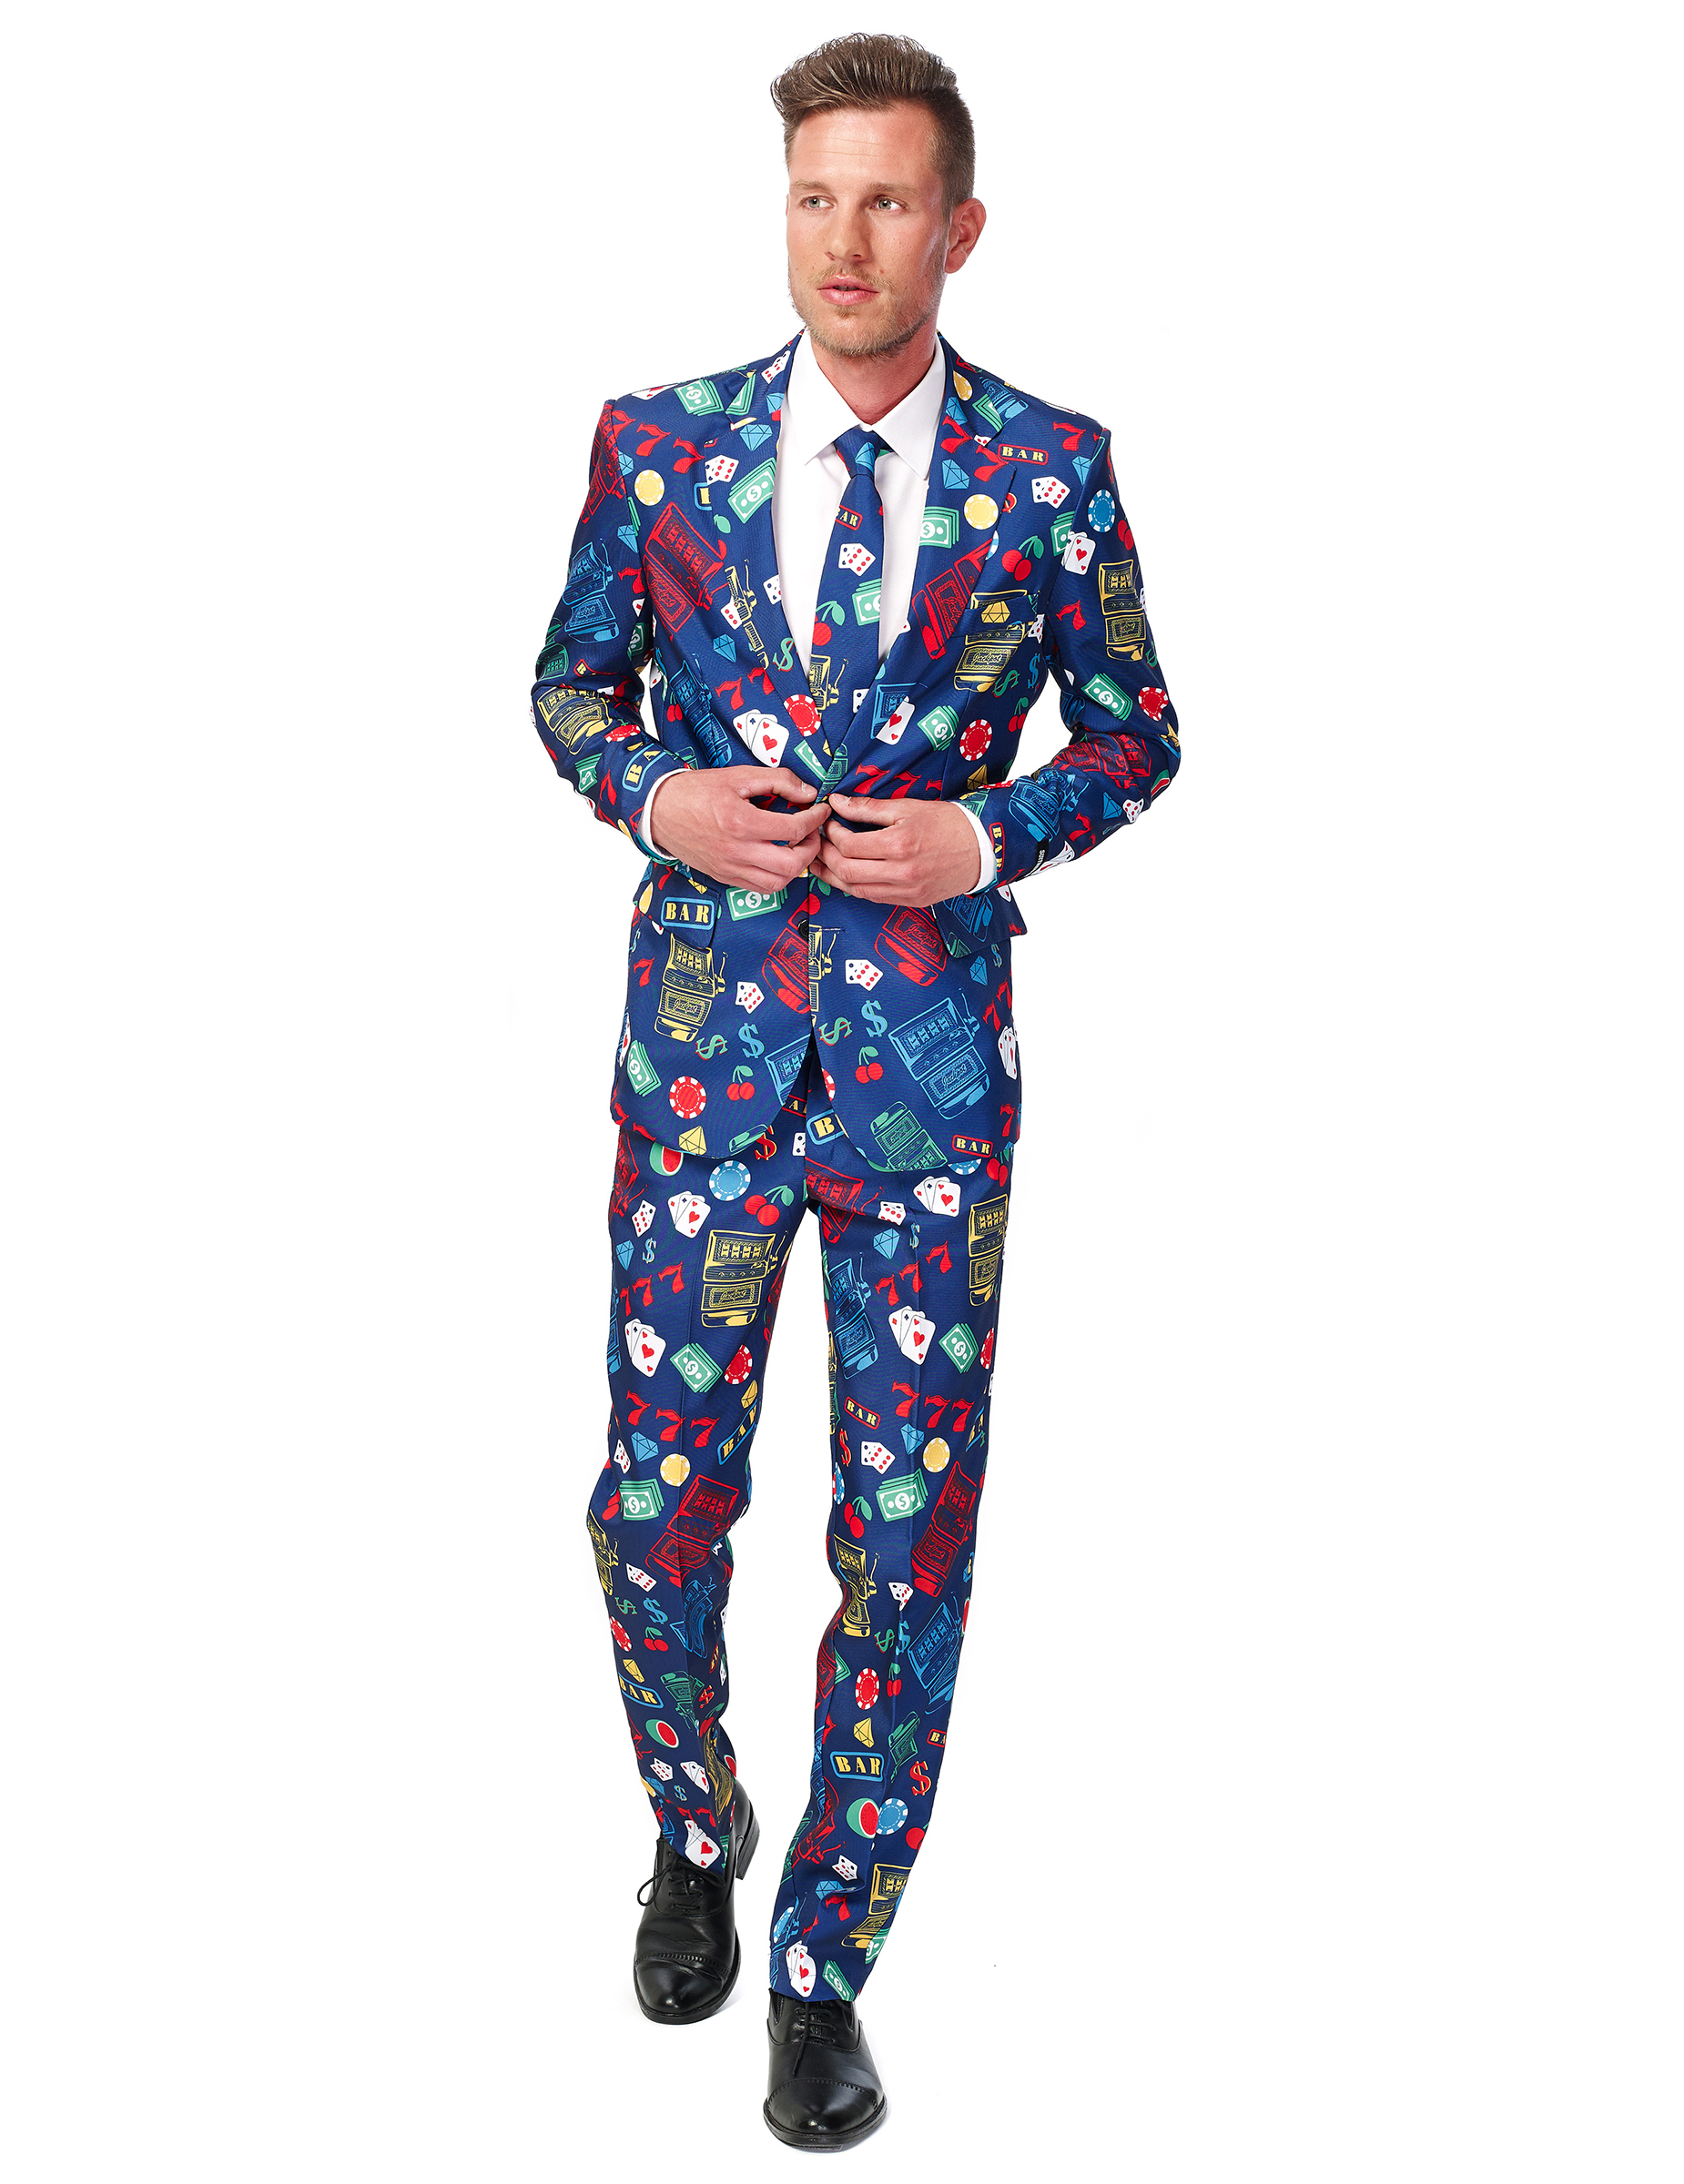 costume mr casino homme suitmeister deguise toi achat de d guisements adultes. Black Bedroom Furniture Sets. Home Design Ideas